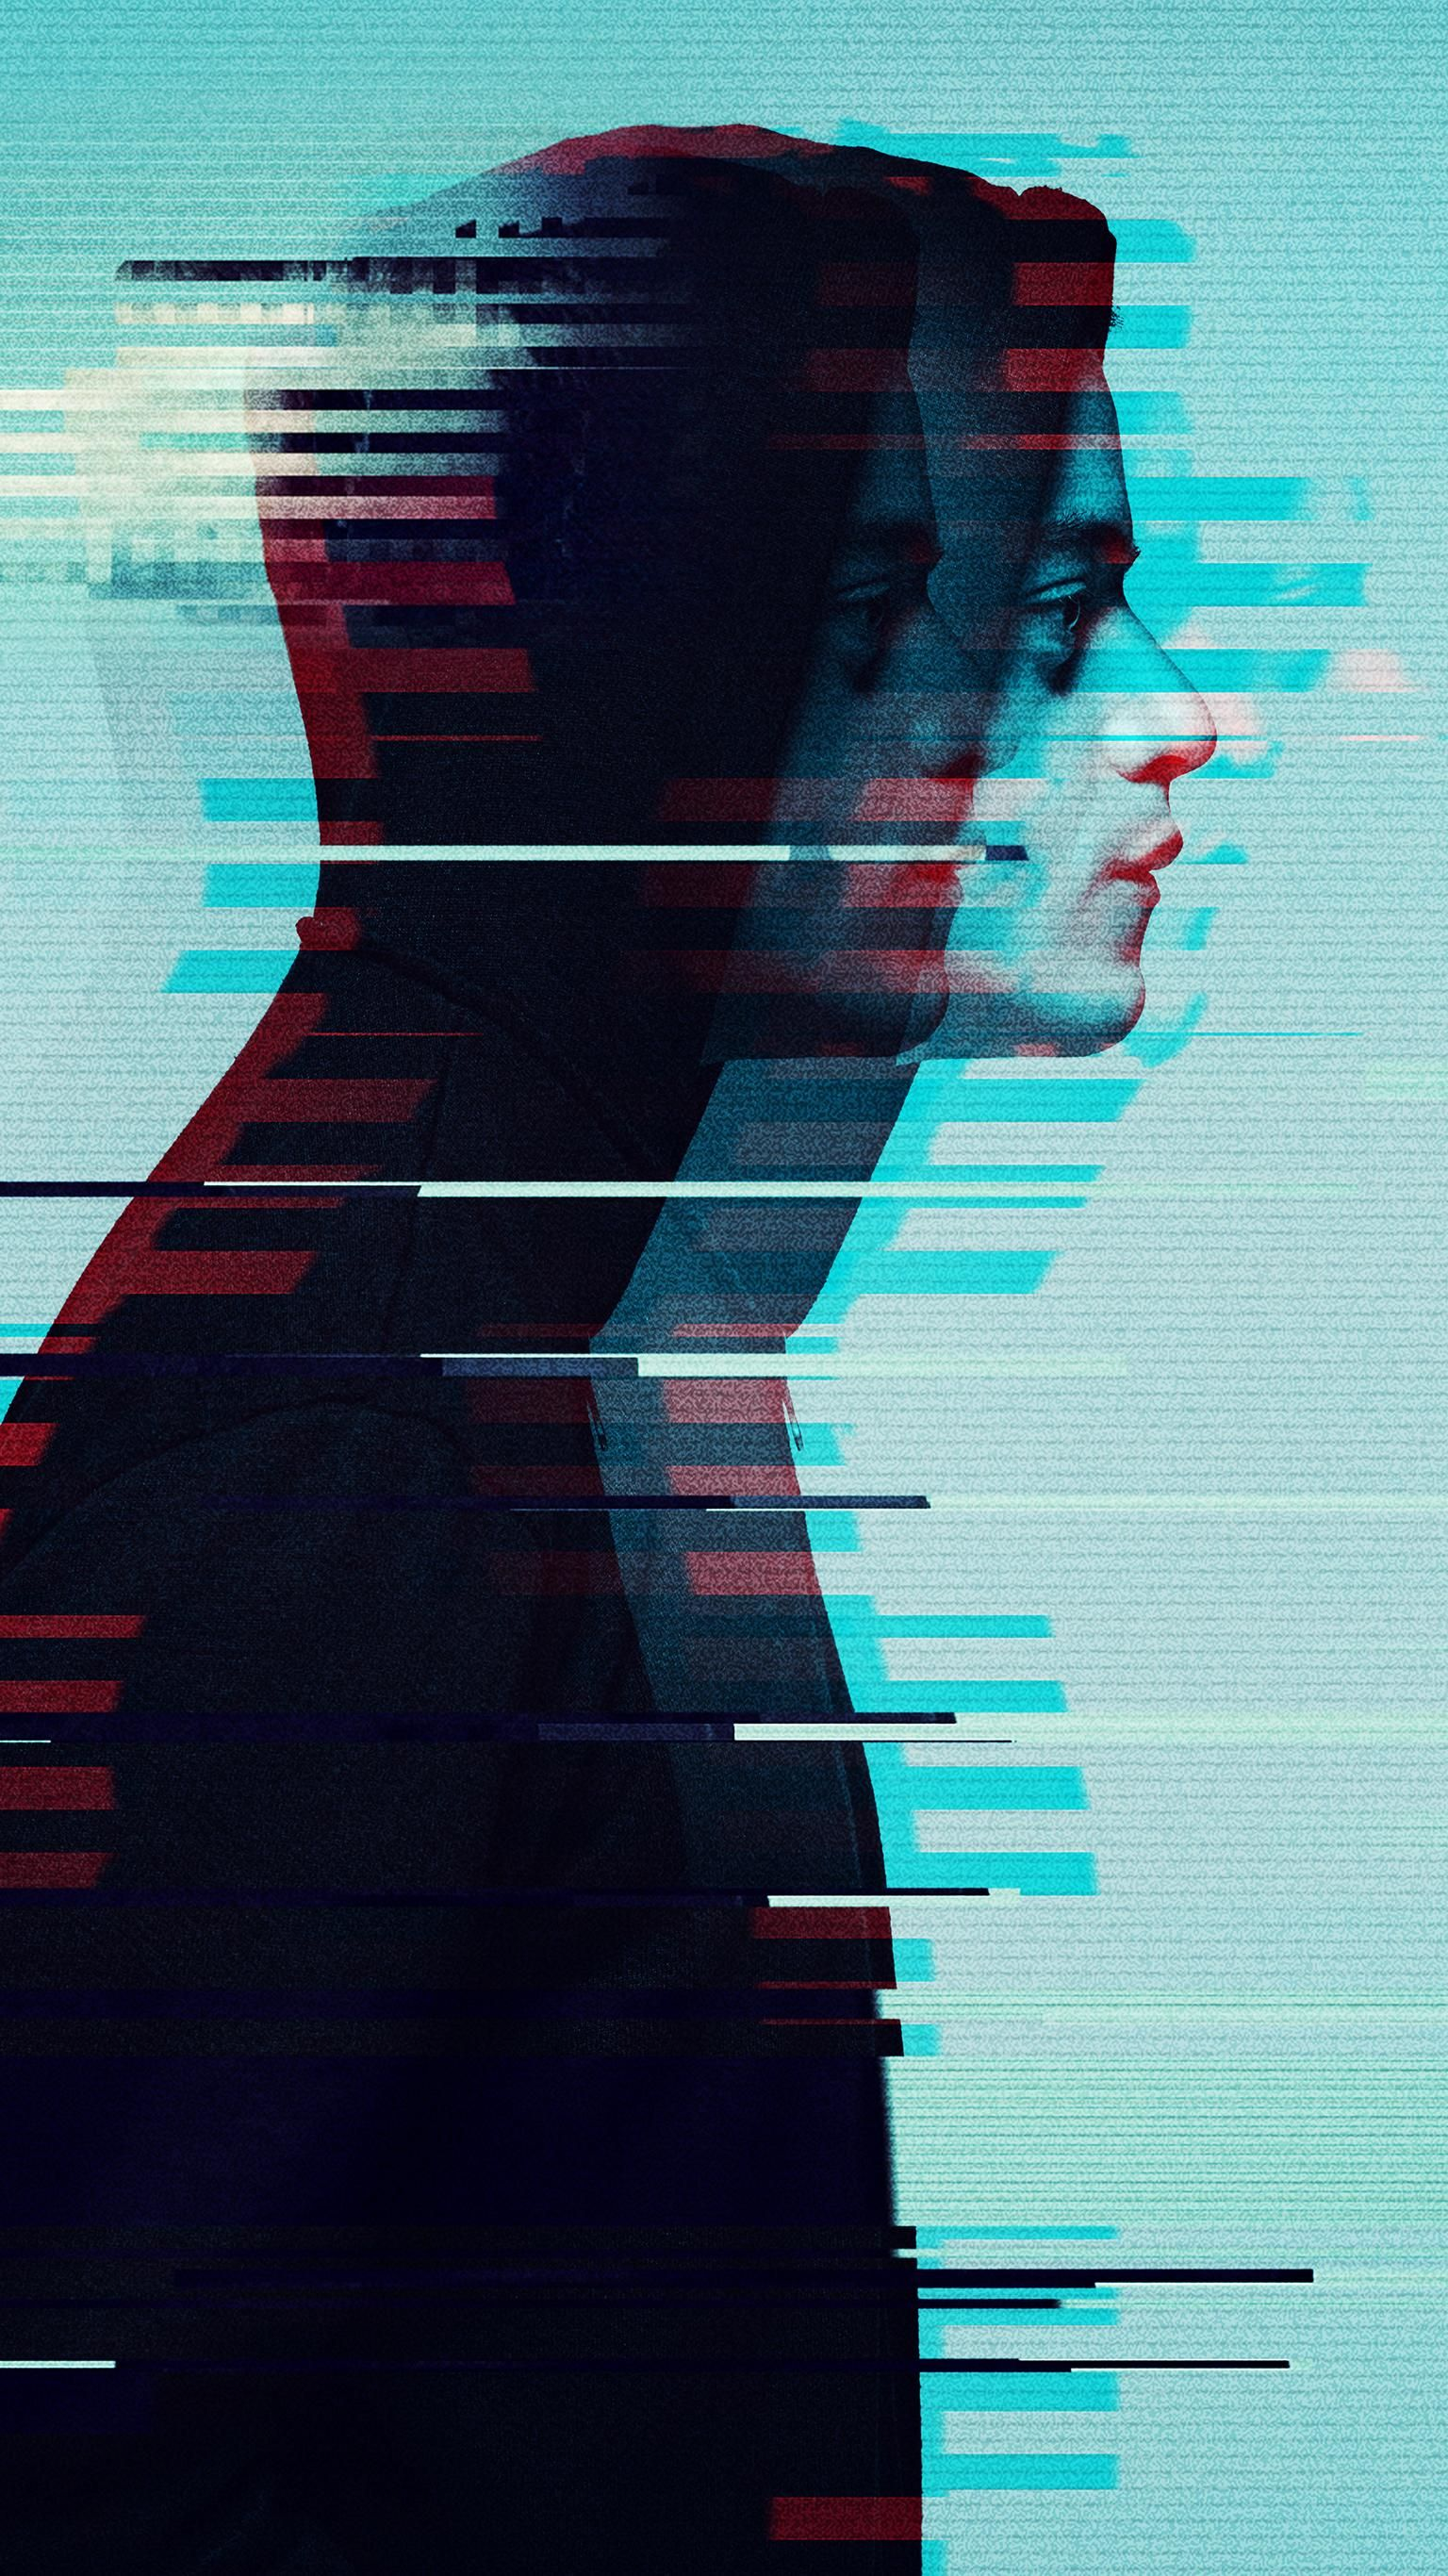 Mr. Robot Phone Wallpaper | Moviemania | Bad trip, Planos ...